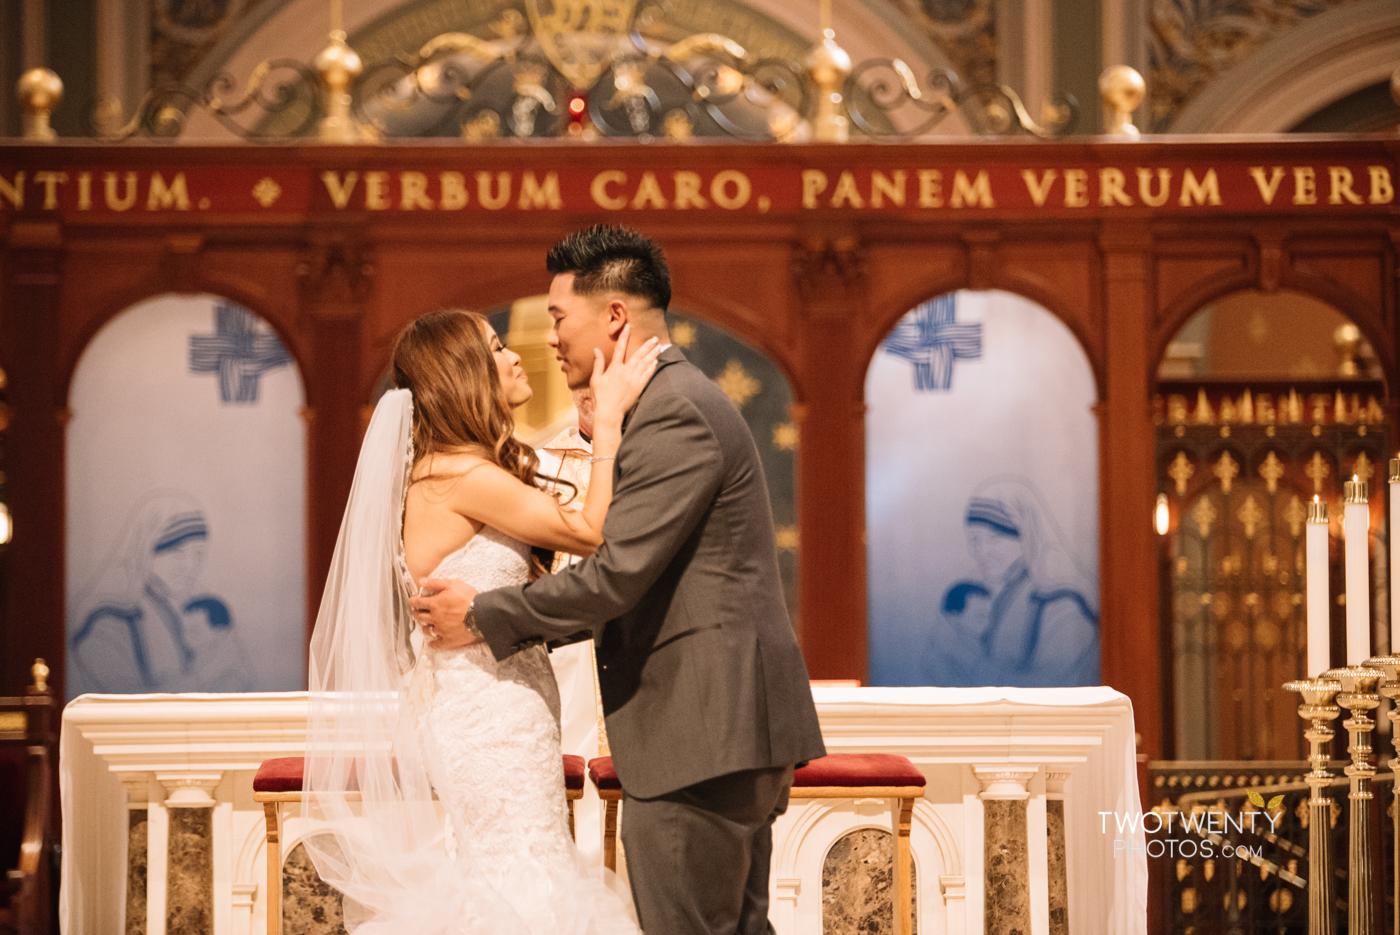 cathedral-of-the-sacred-sacrament-downtown-sacramento-wedding-photographer-27